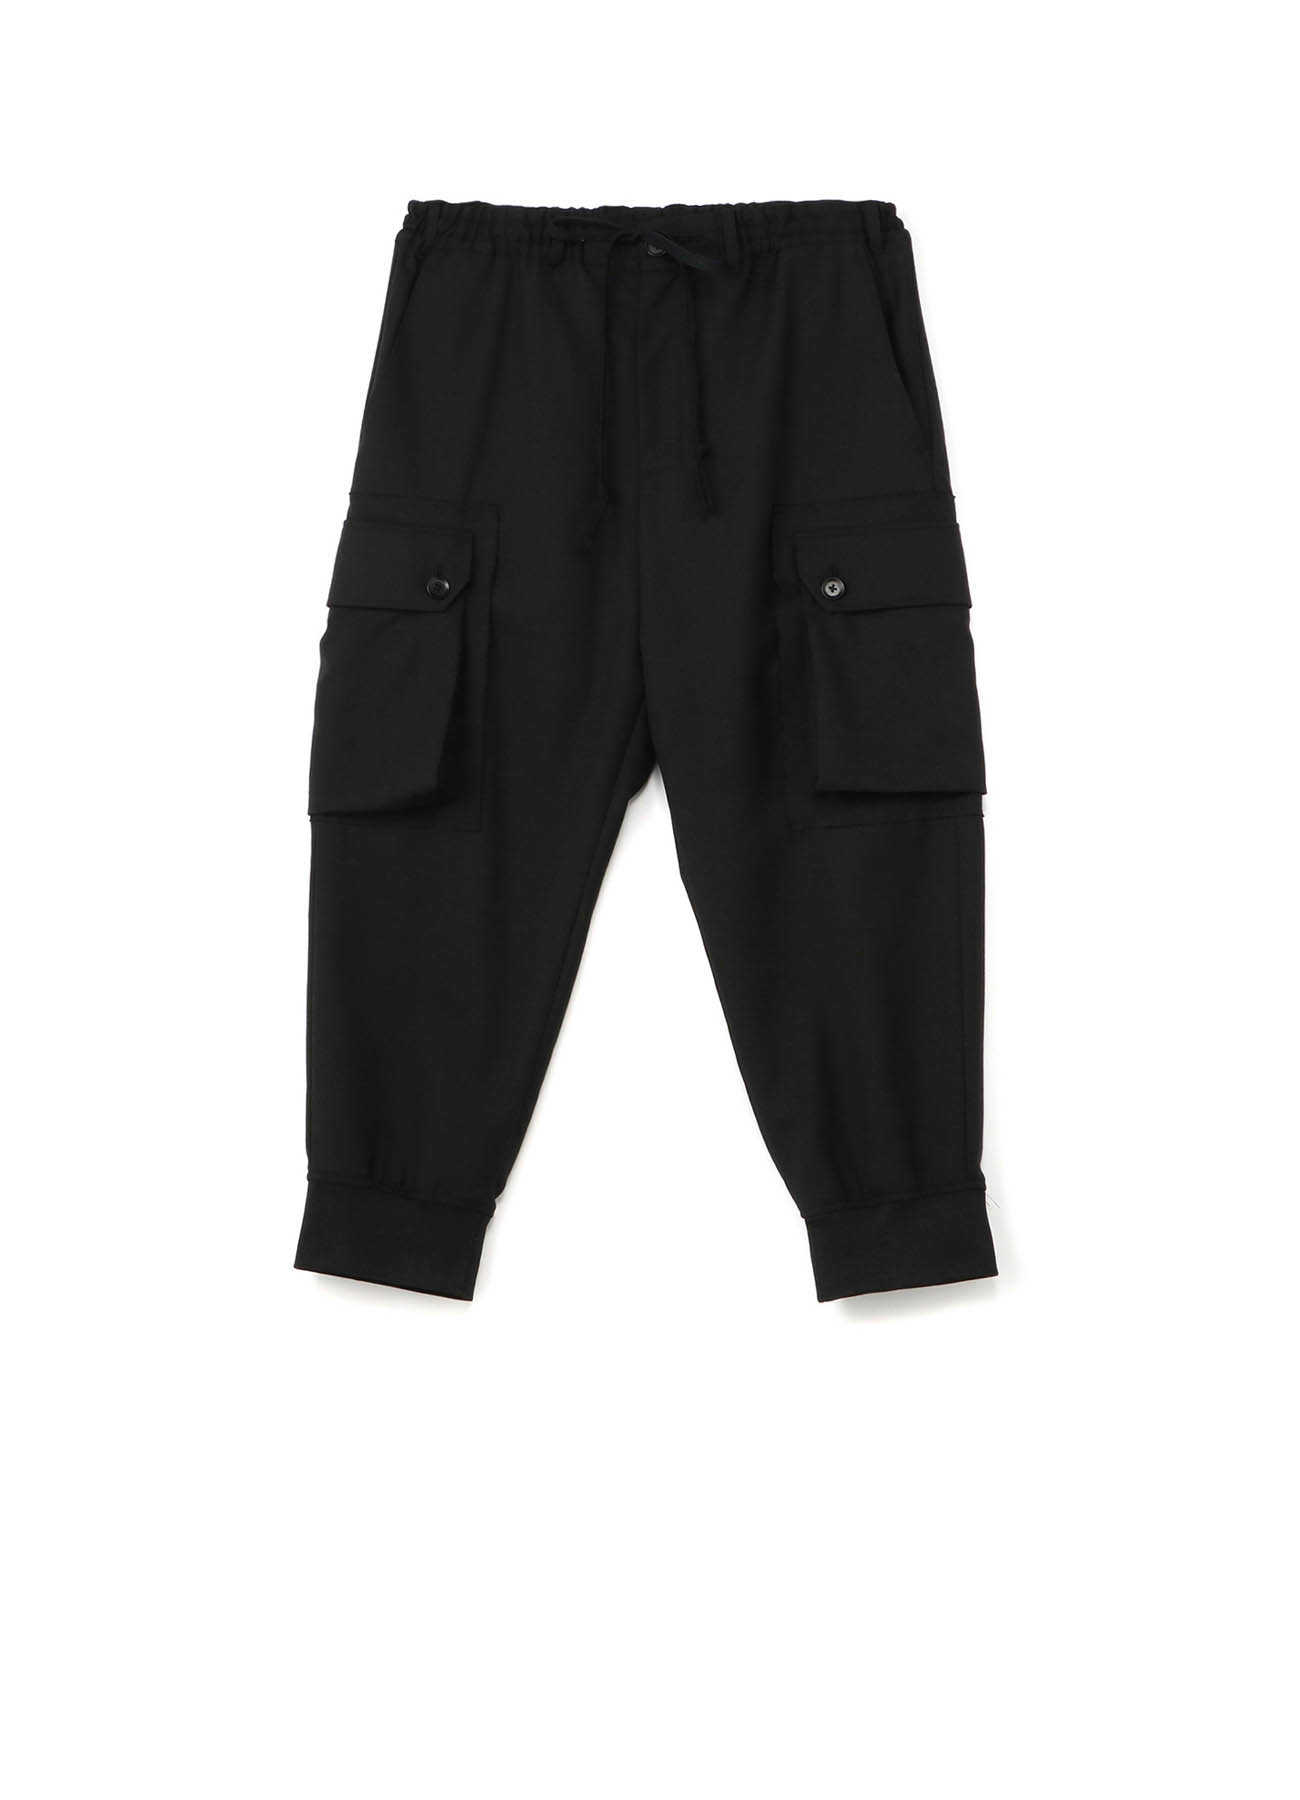 T/W gaberdine Military Cargo Pants